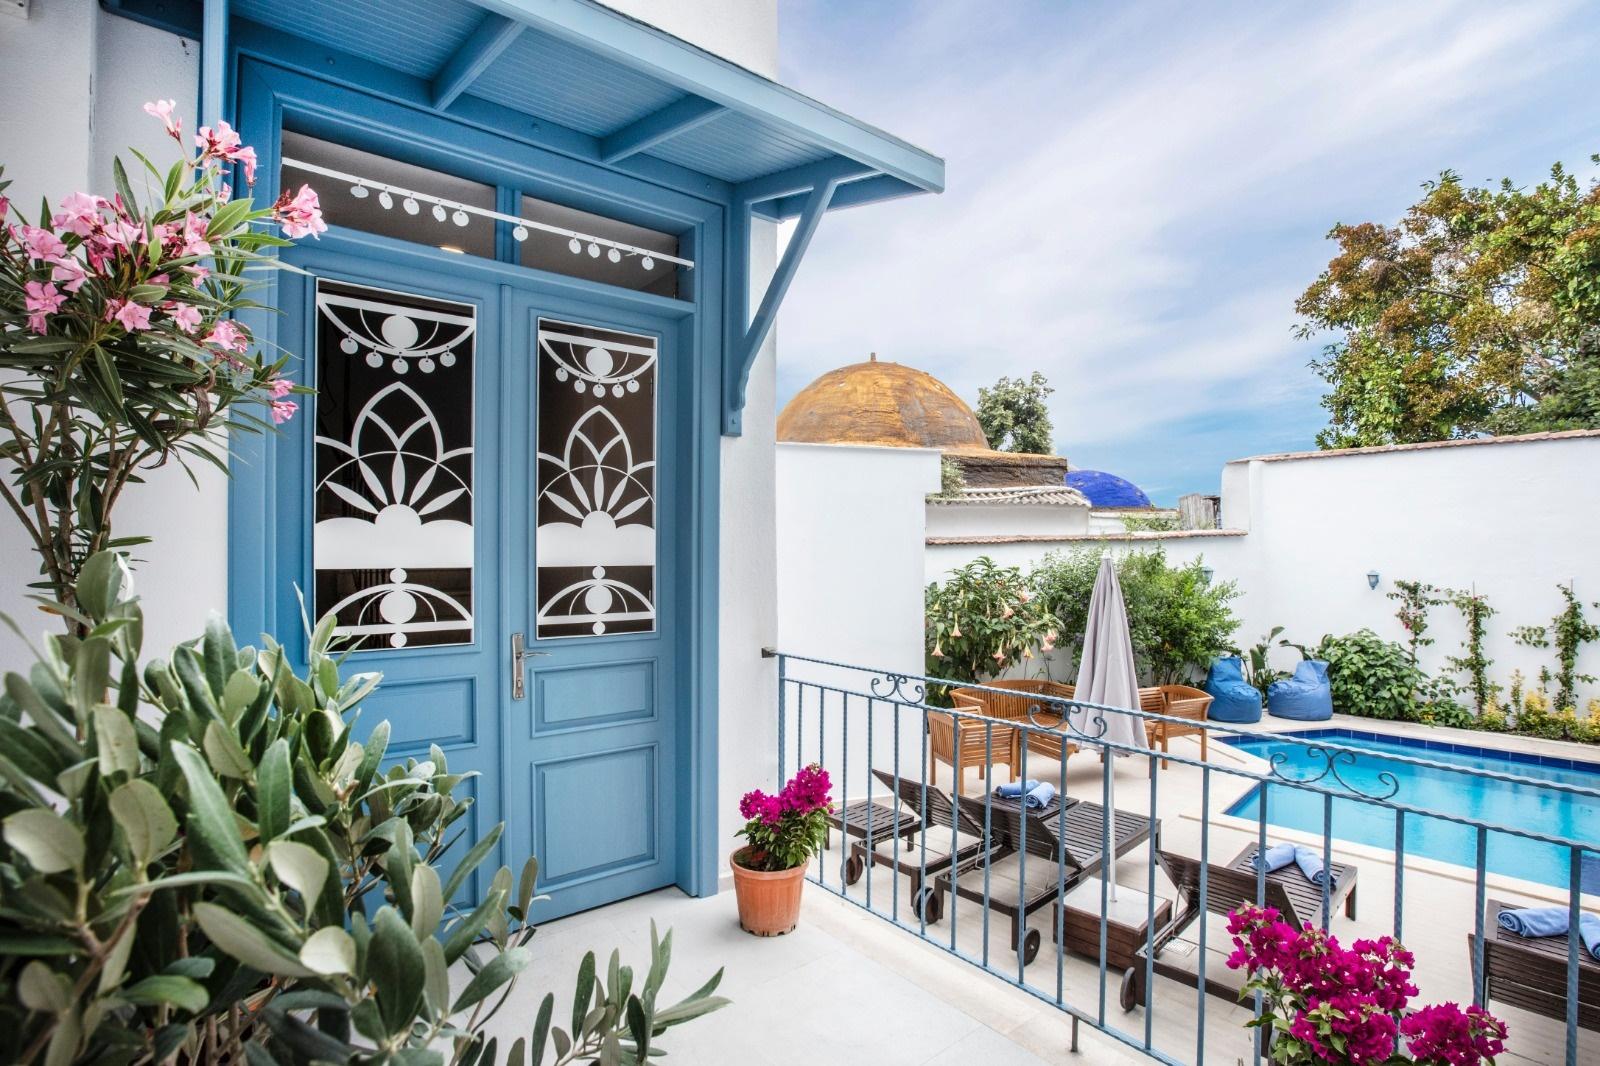 All Inclusive Sun Holidays to Eliada Hotel